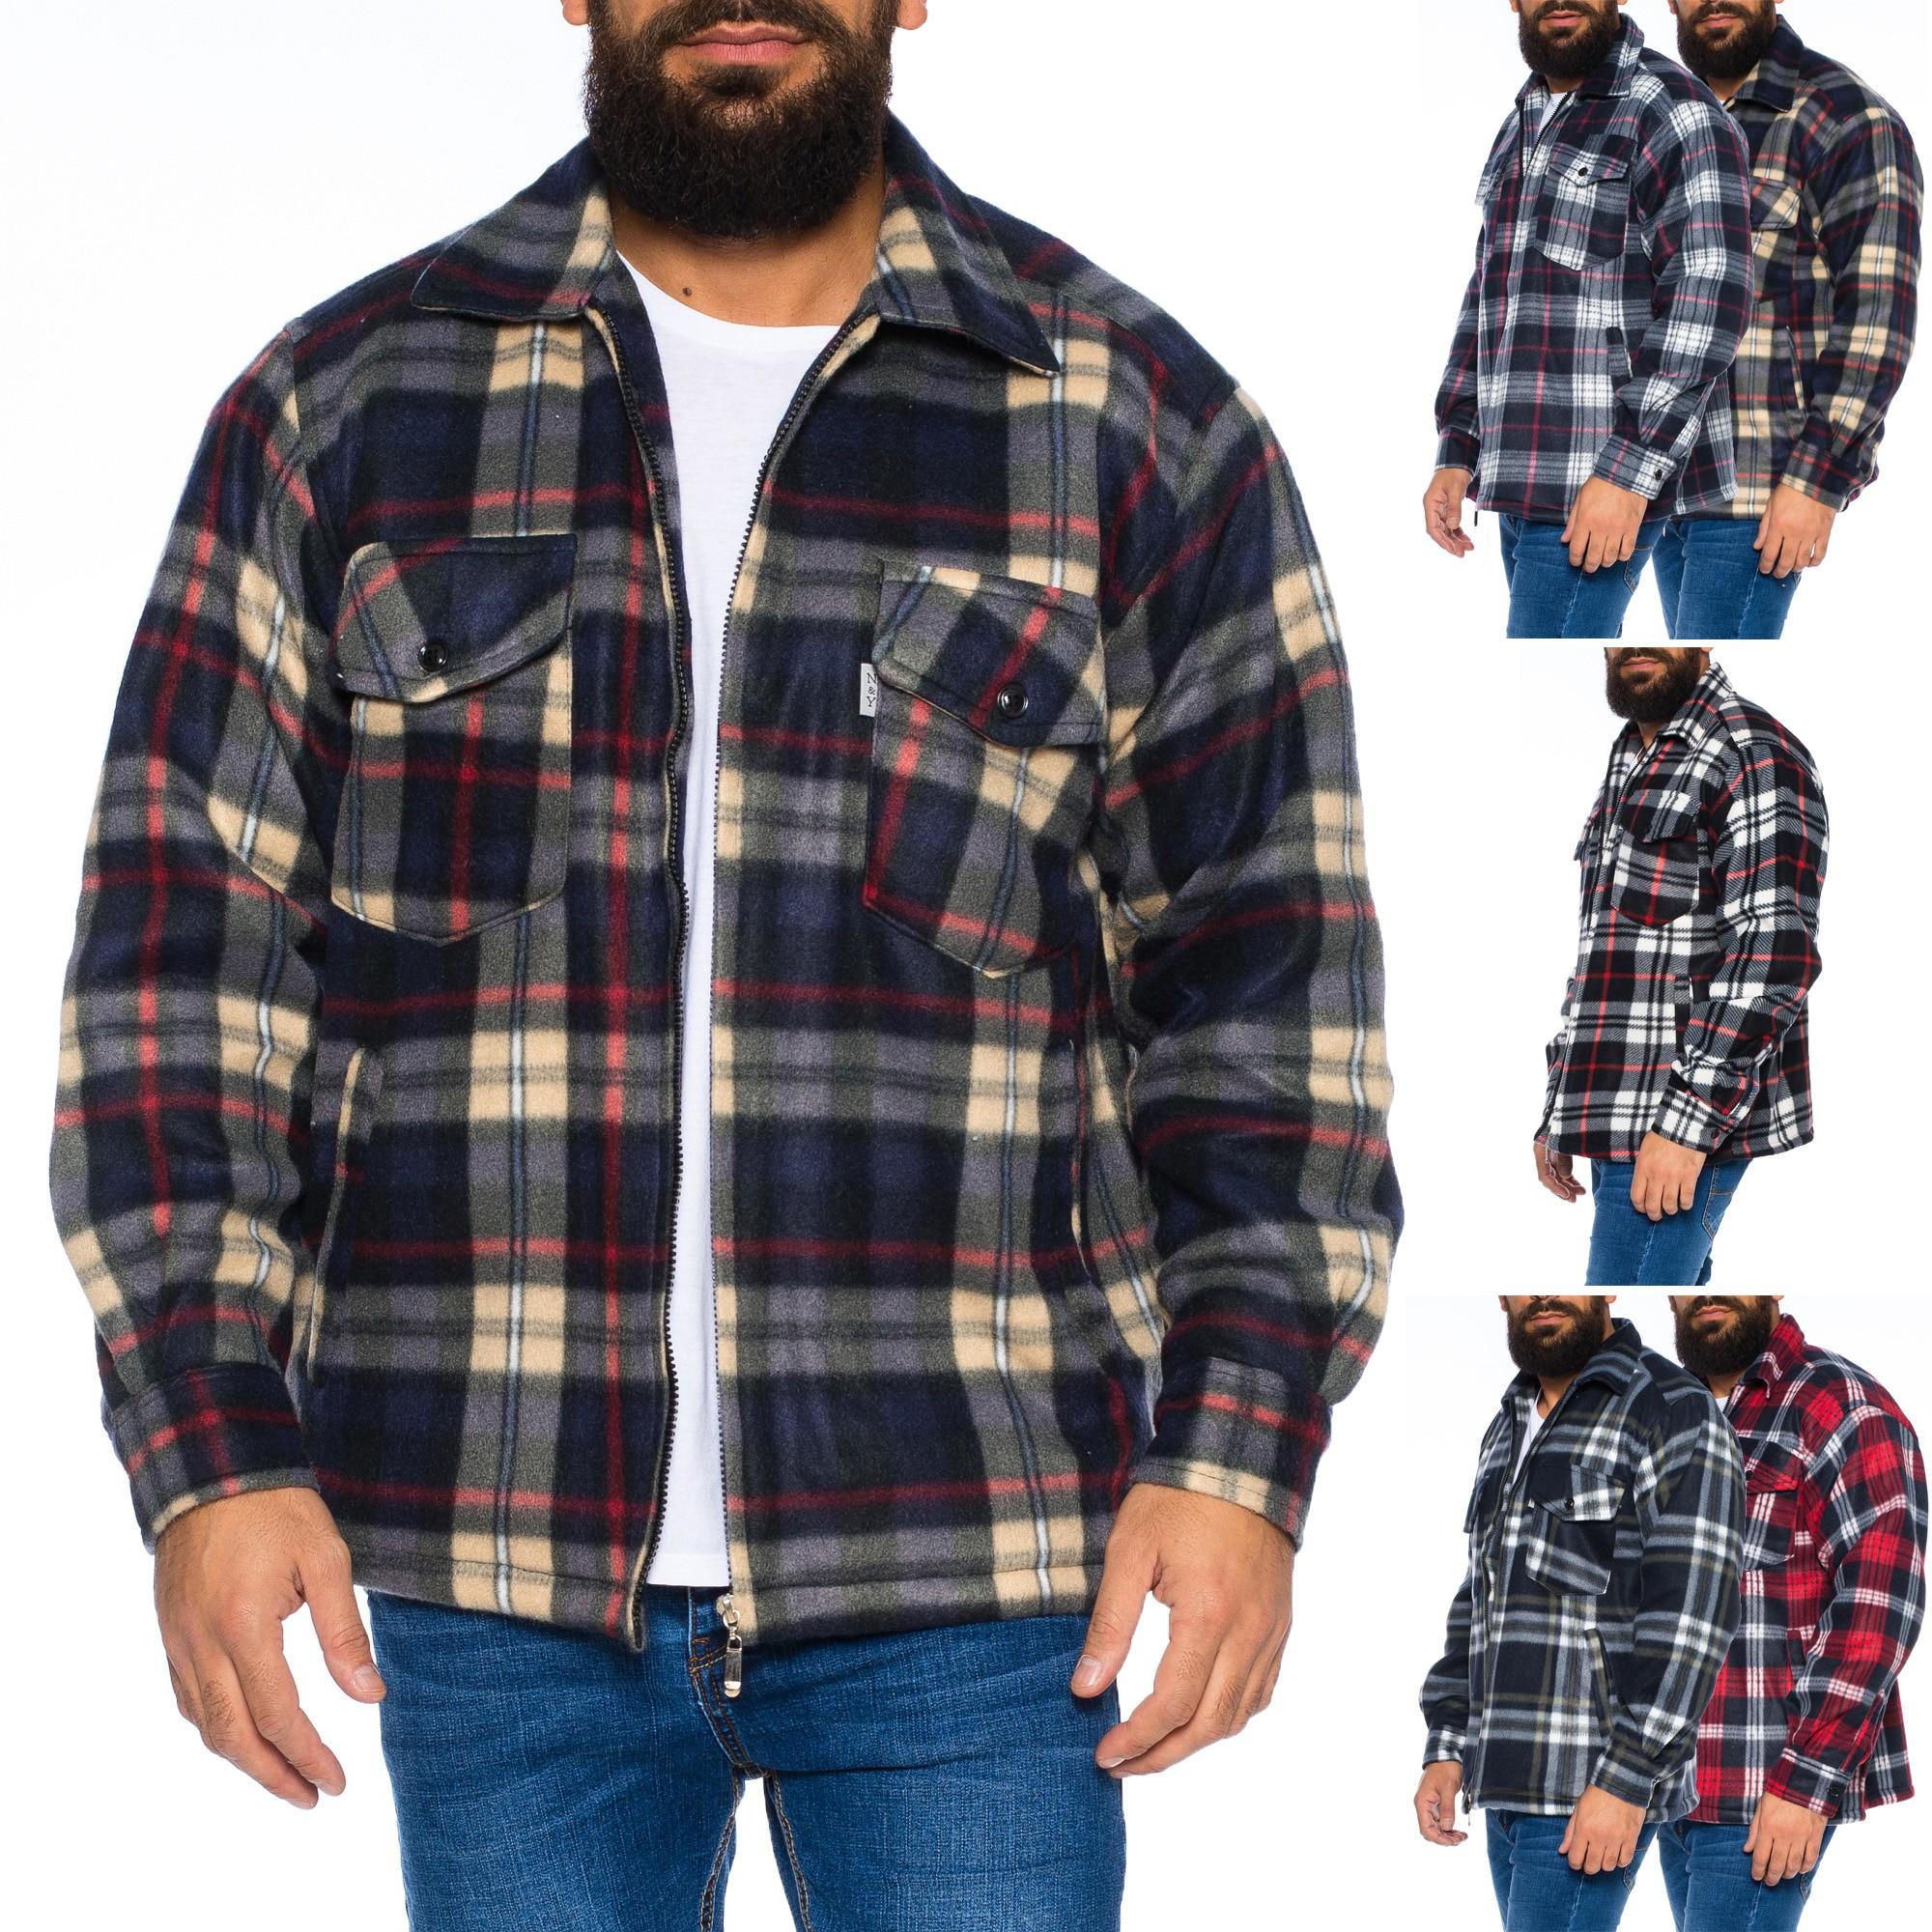 Herren Thermohemd Jacke Hemd Holzfällerhemd Arbeitshemd warm ... acebf835ab